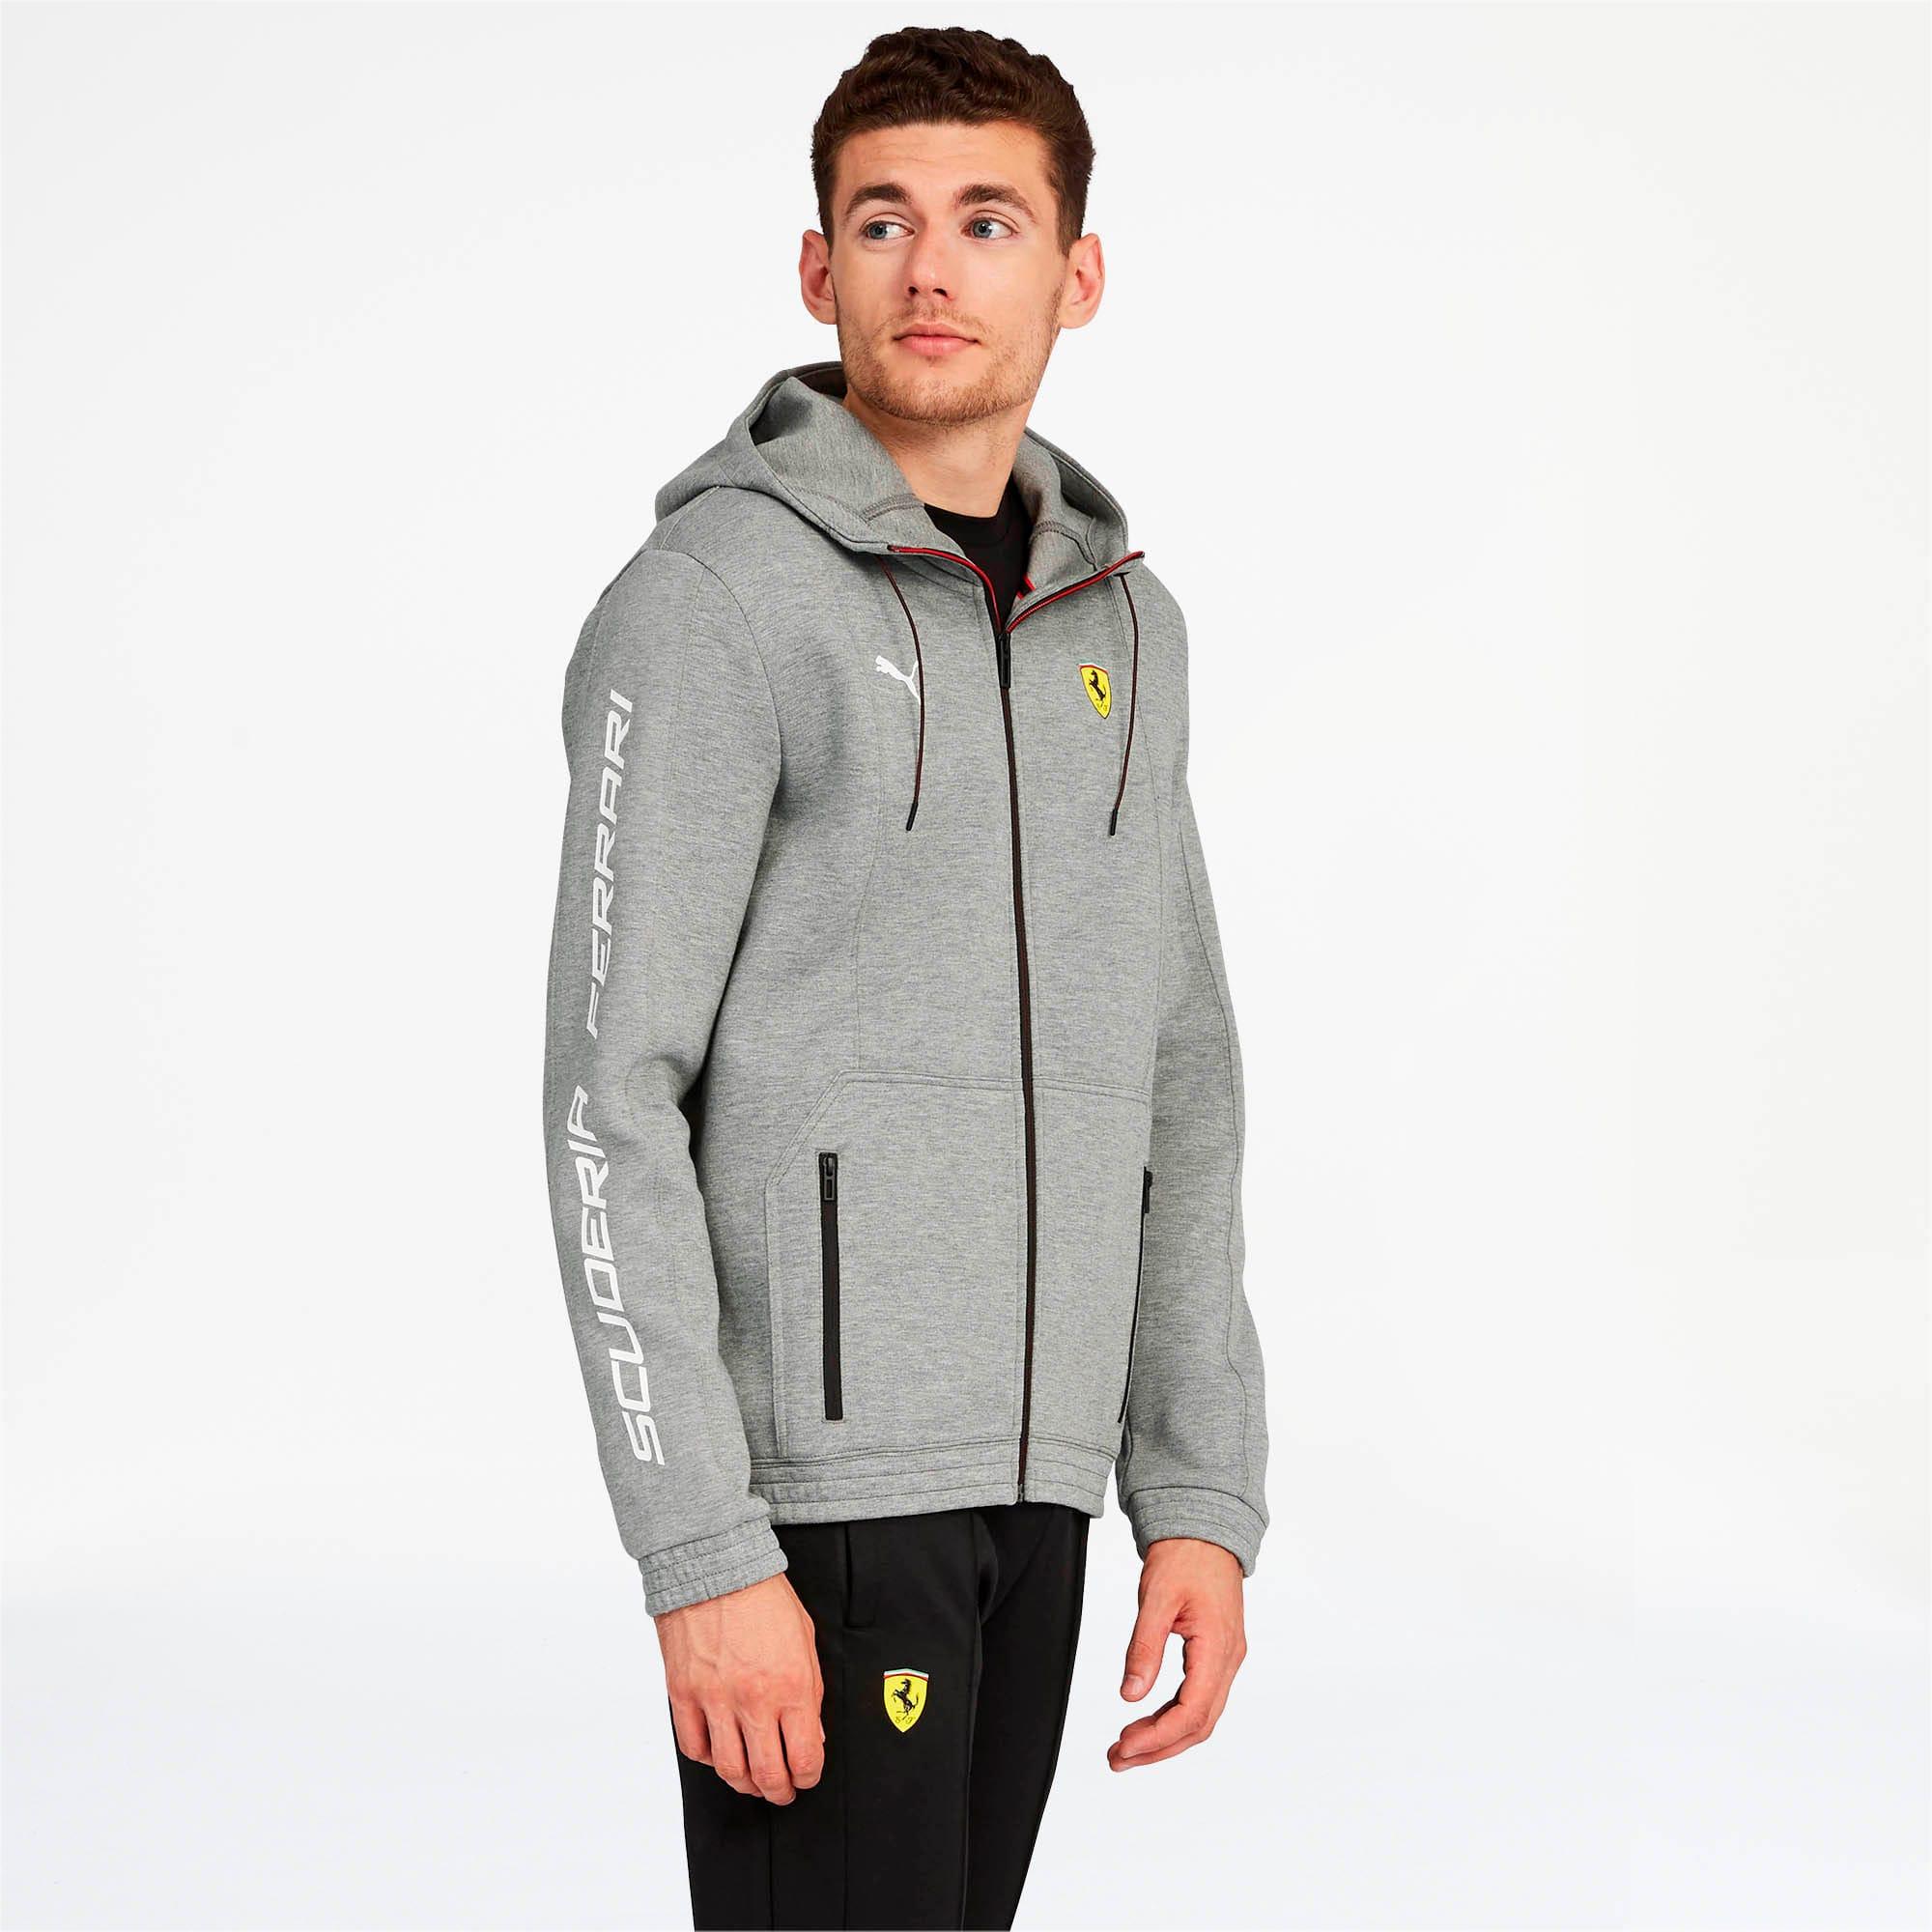 Miniatura 1 de Chaqueta deportiva Scuderia Ferrari con capucha, para hombre, Medium Gray Heather, mediano